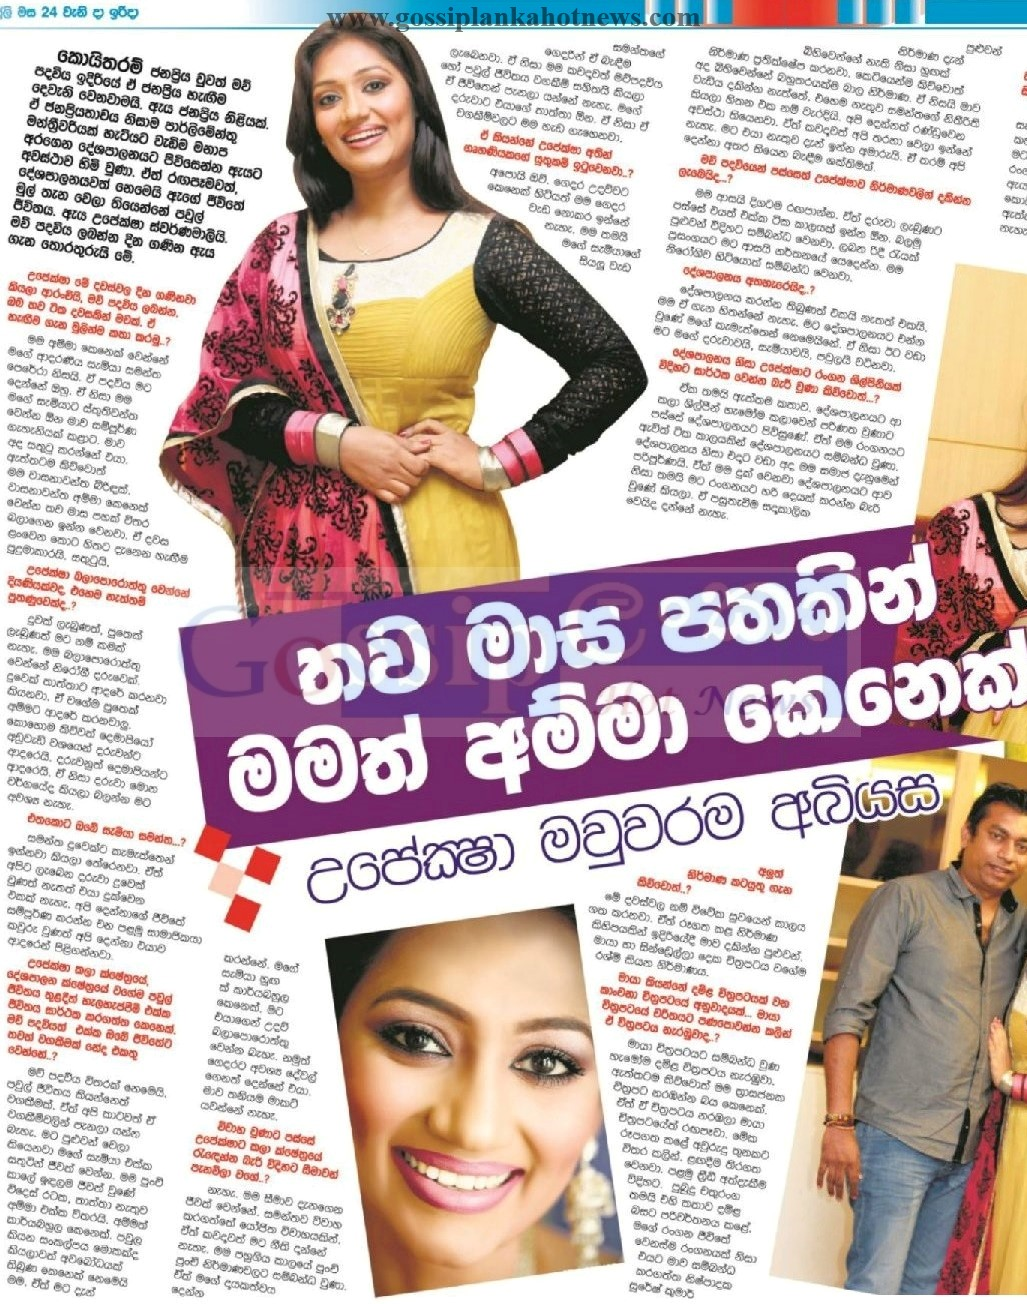 Sinhala Litha 2018 >> මවක් වෙන්න යයි - Upeksha Swarnamali to become a mother | Sri Lanka Newspaper Articles